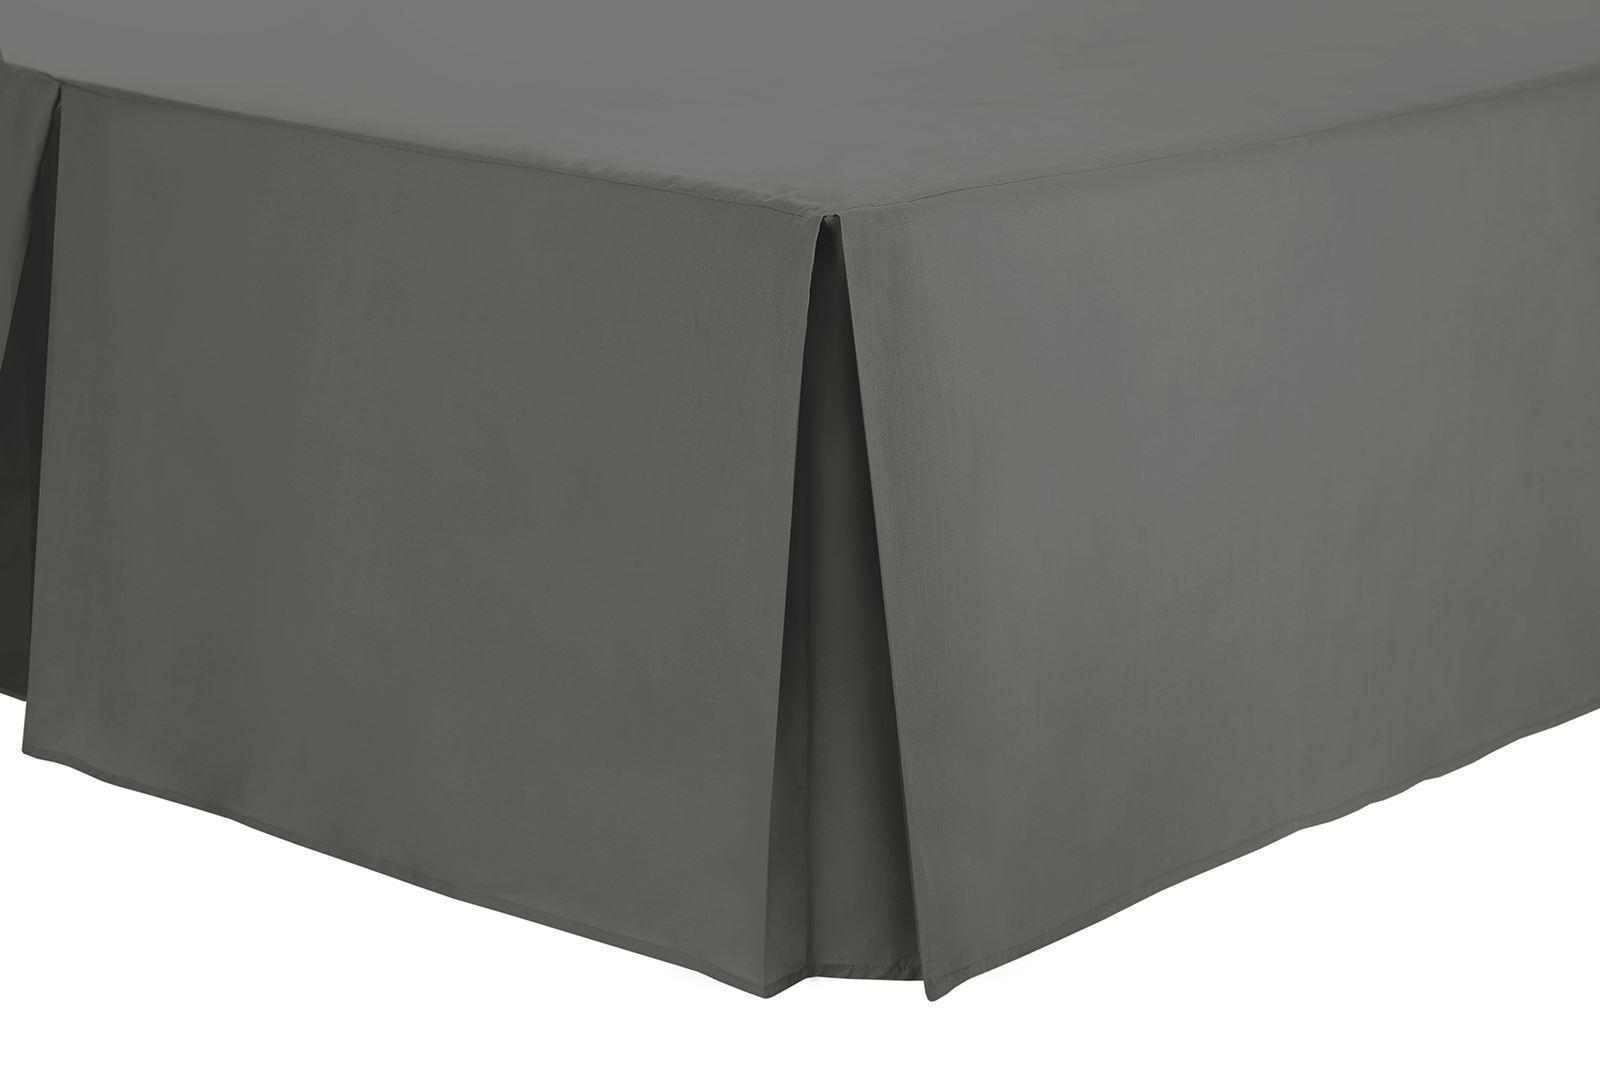 16inch 40cm Skirt Plain Coloured Box Pleated Bed Platform